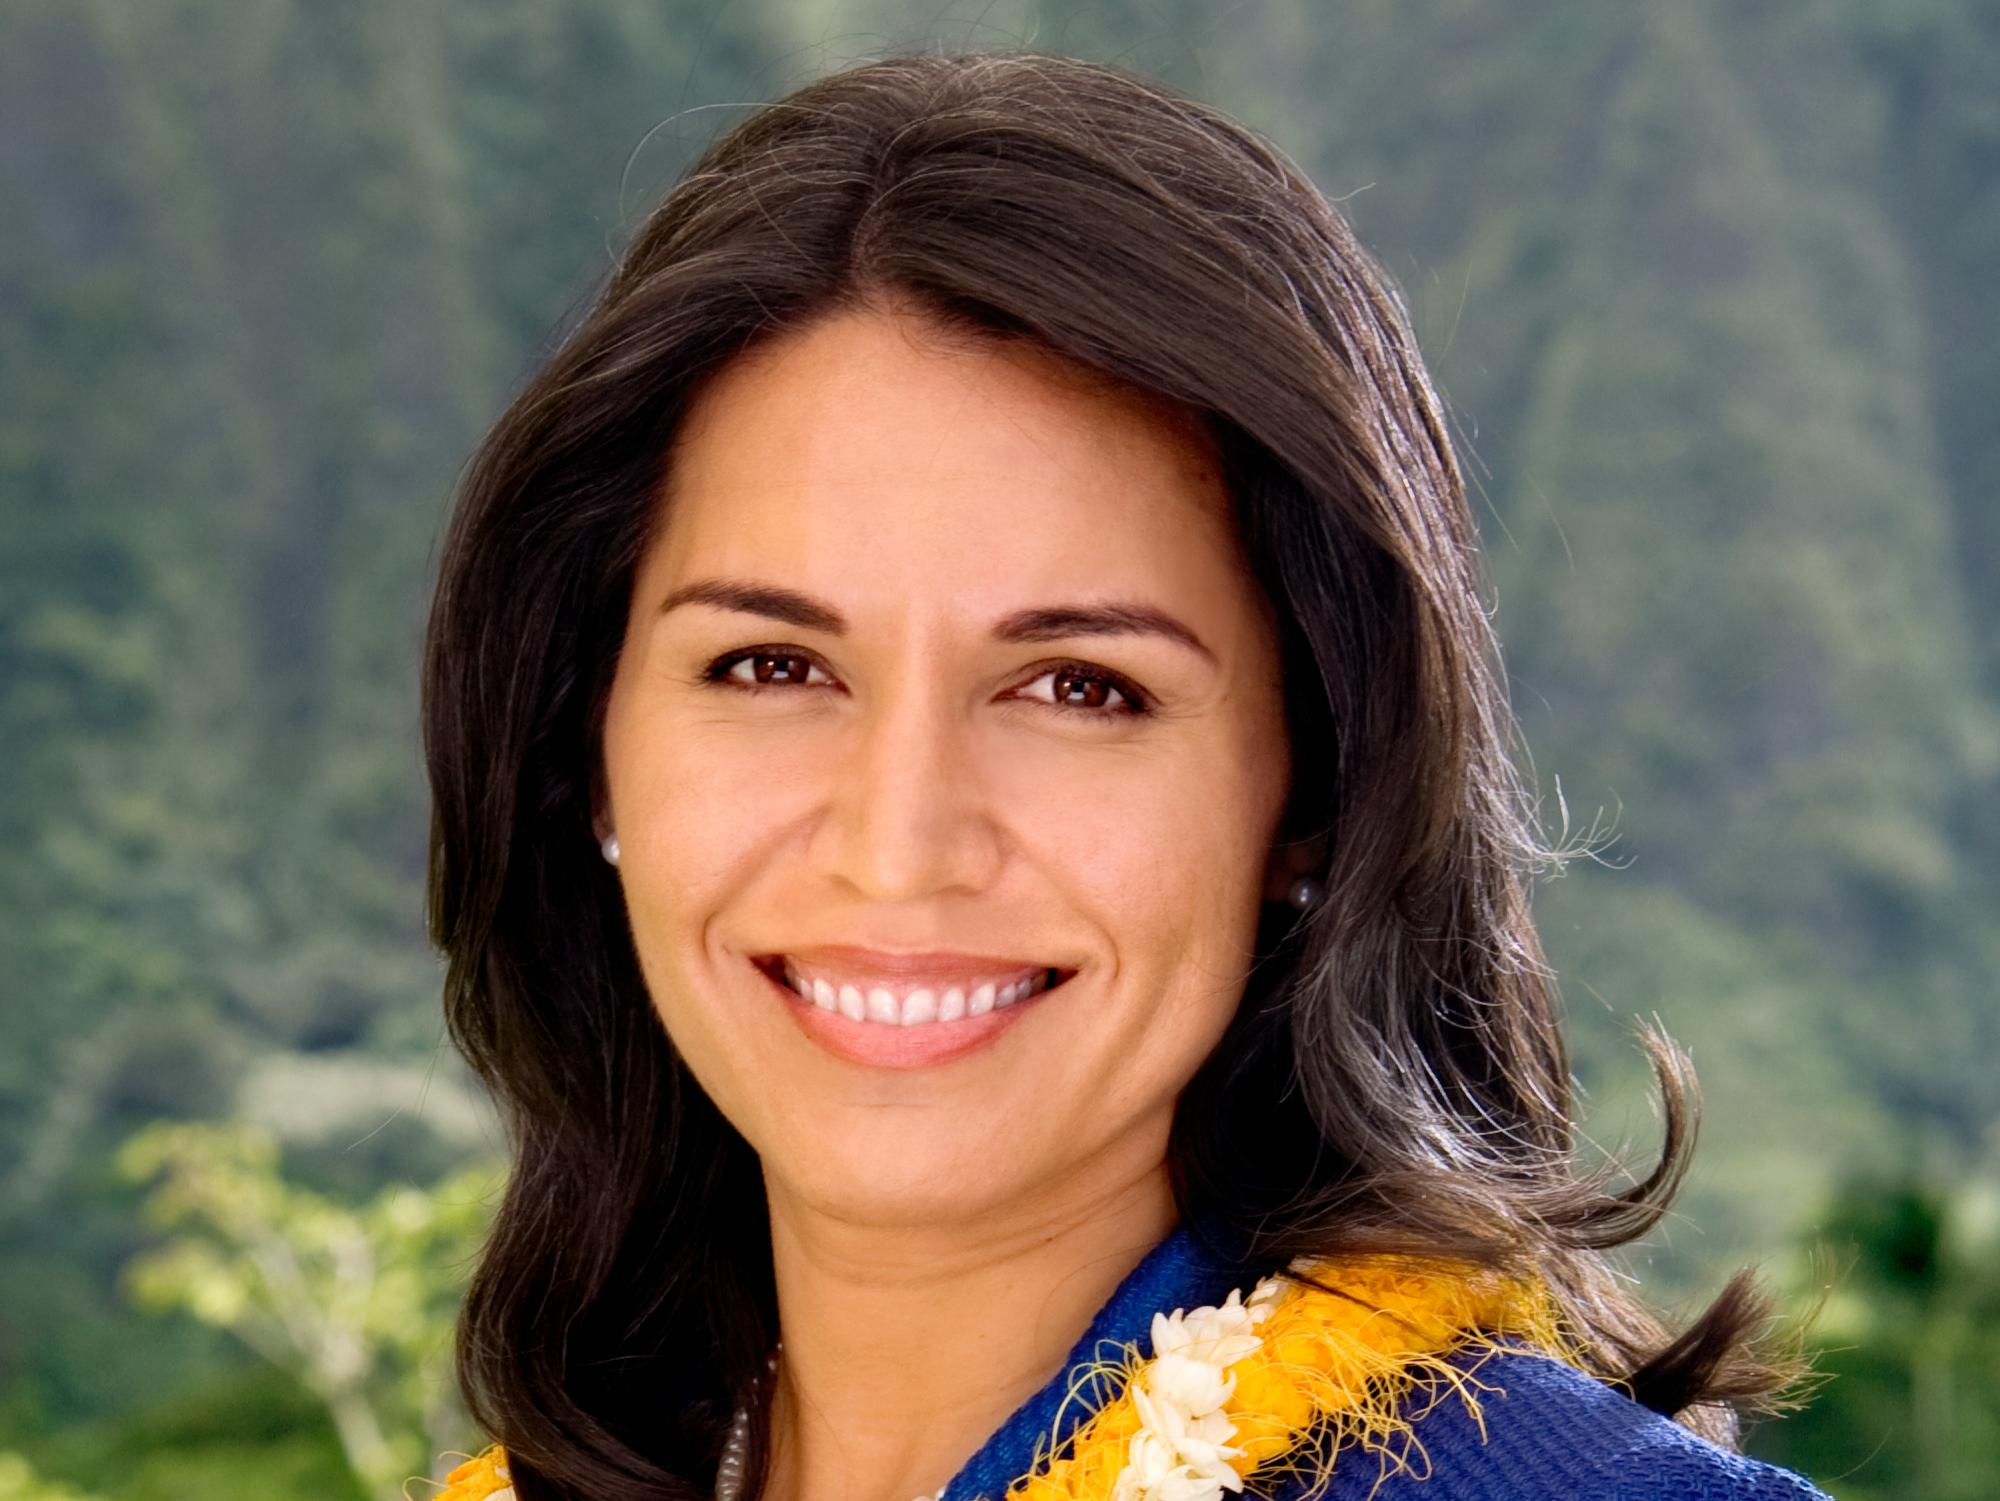 2020 Presidential Candidate Tulsi Gabbard